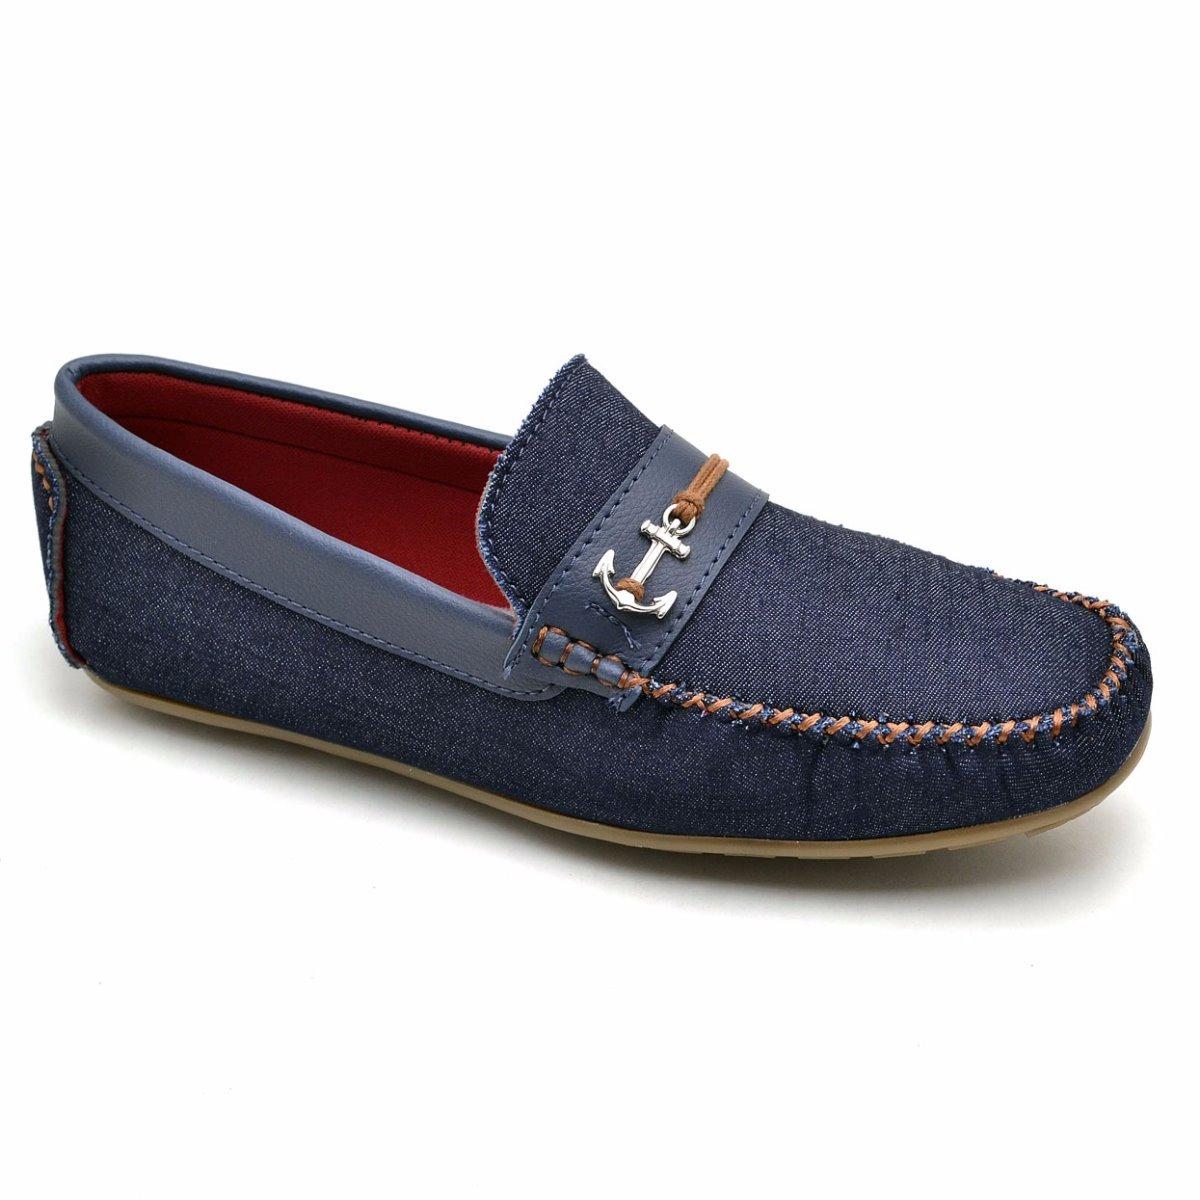 938036d516 sapato mocassim infantil masculino couro casual 4 cores. Carregando zoom.